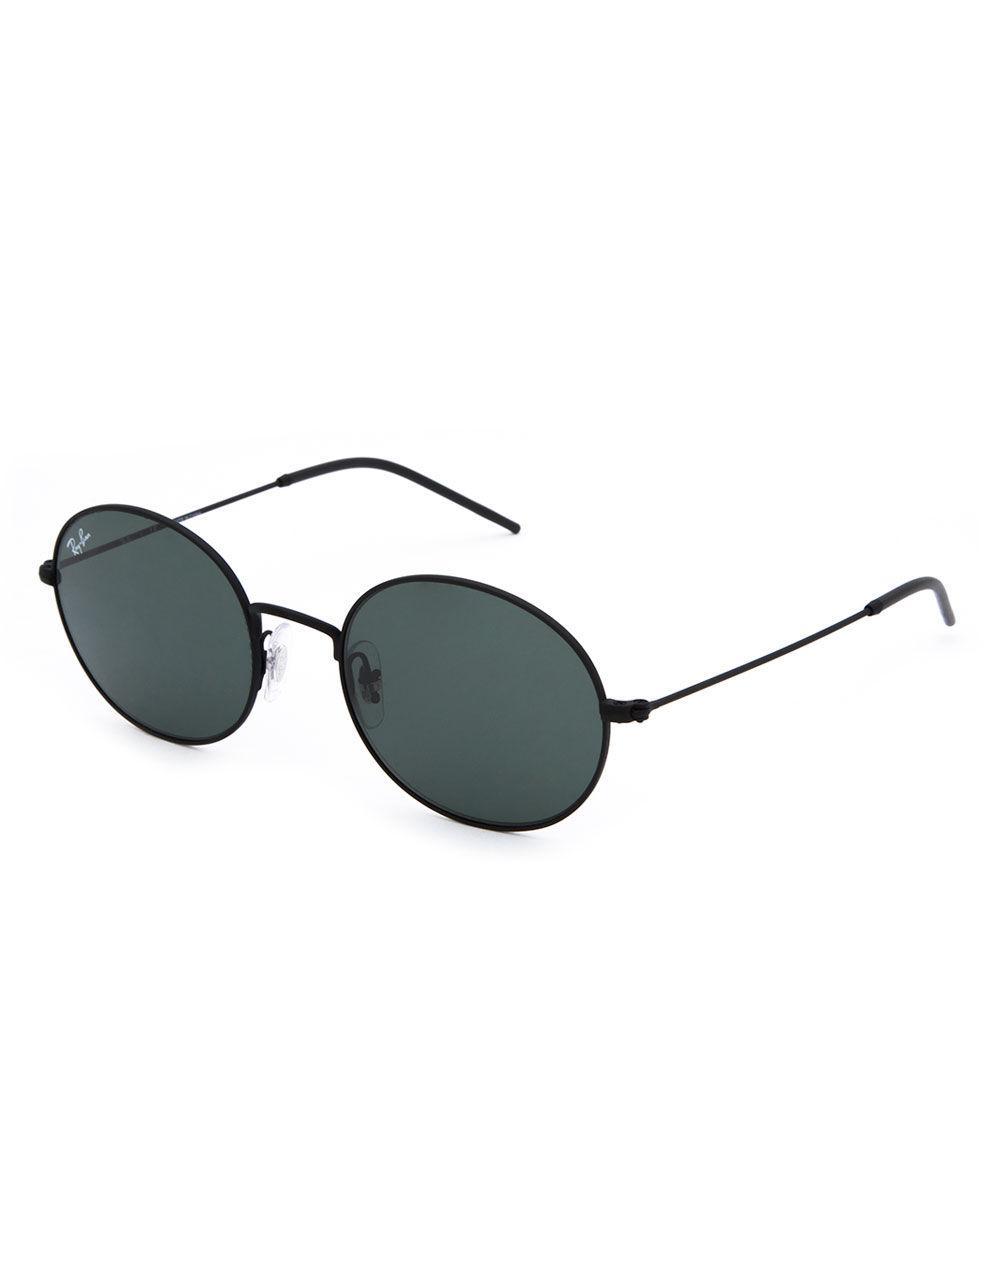 Lyst - Ray-Ban Beat Sunglasses in Black